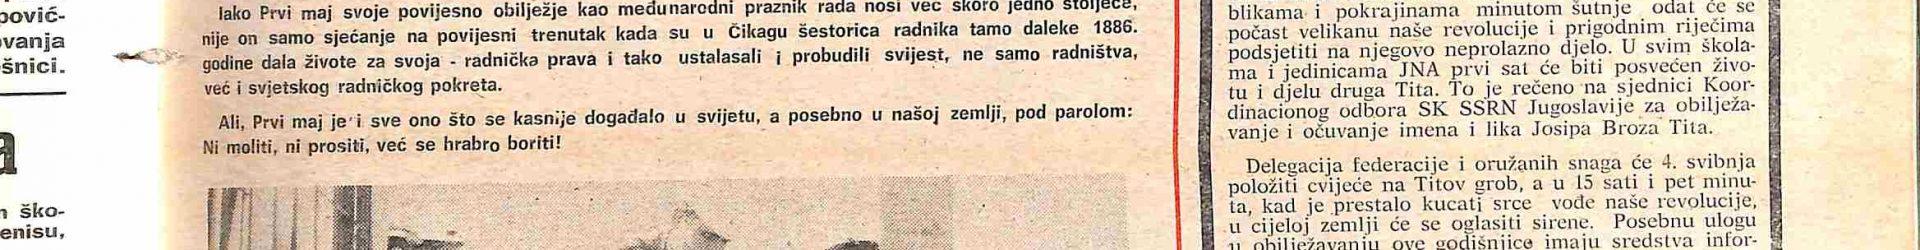 29 travnja 1983_Page_01